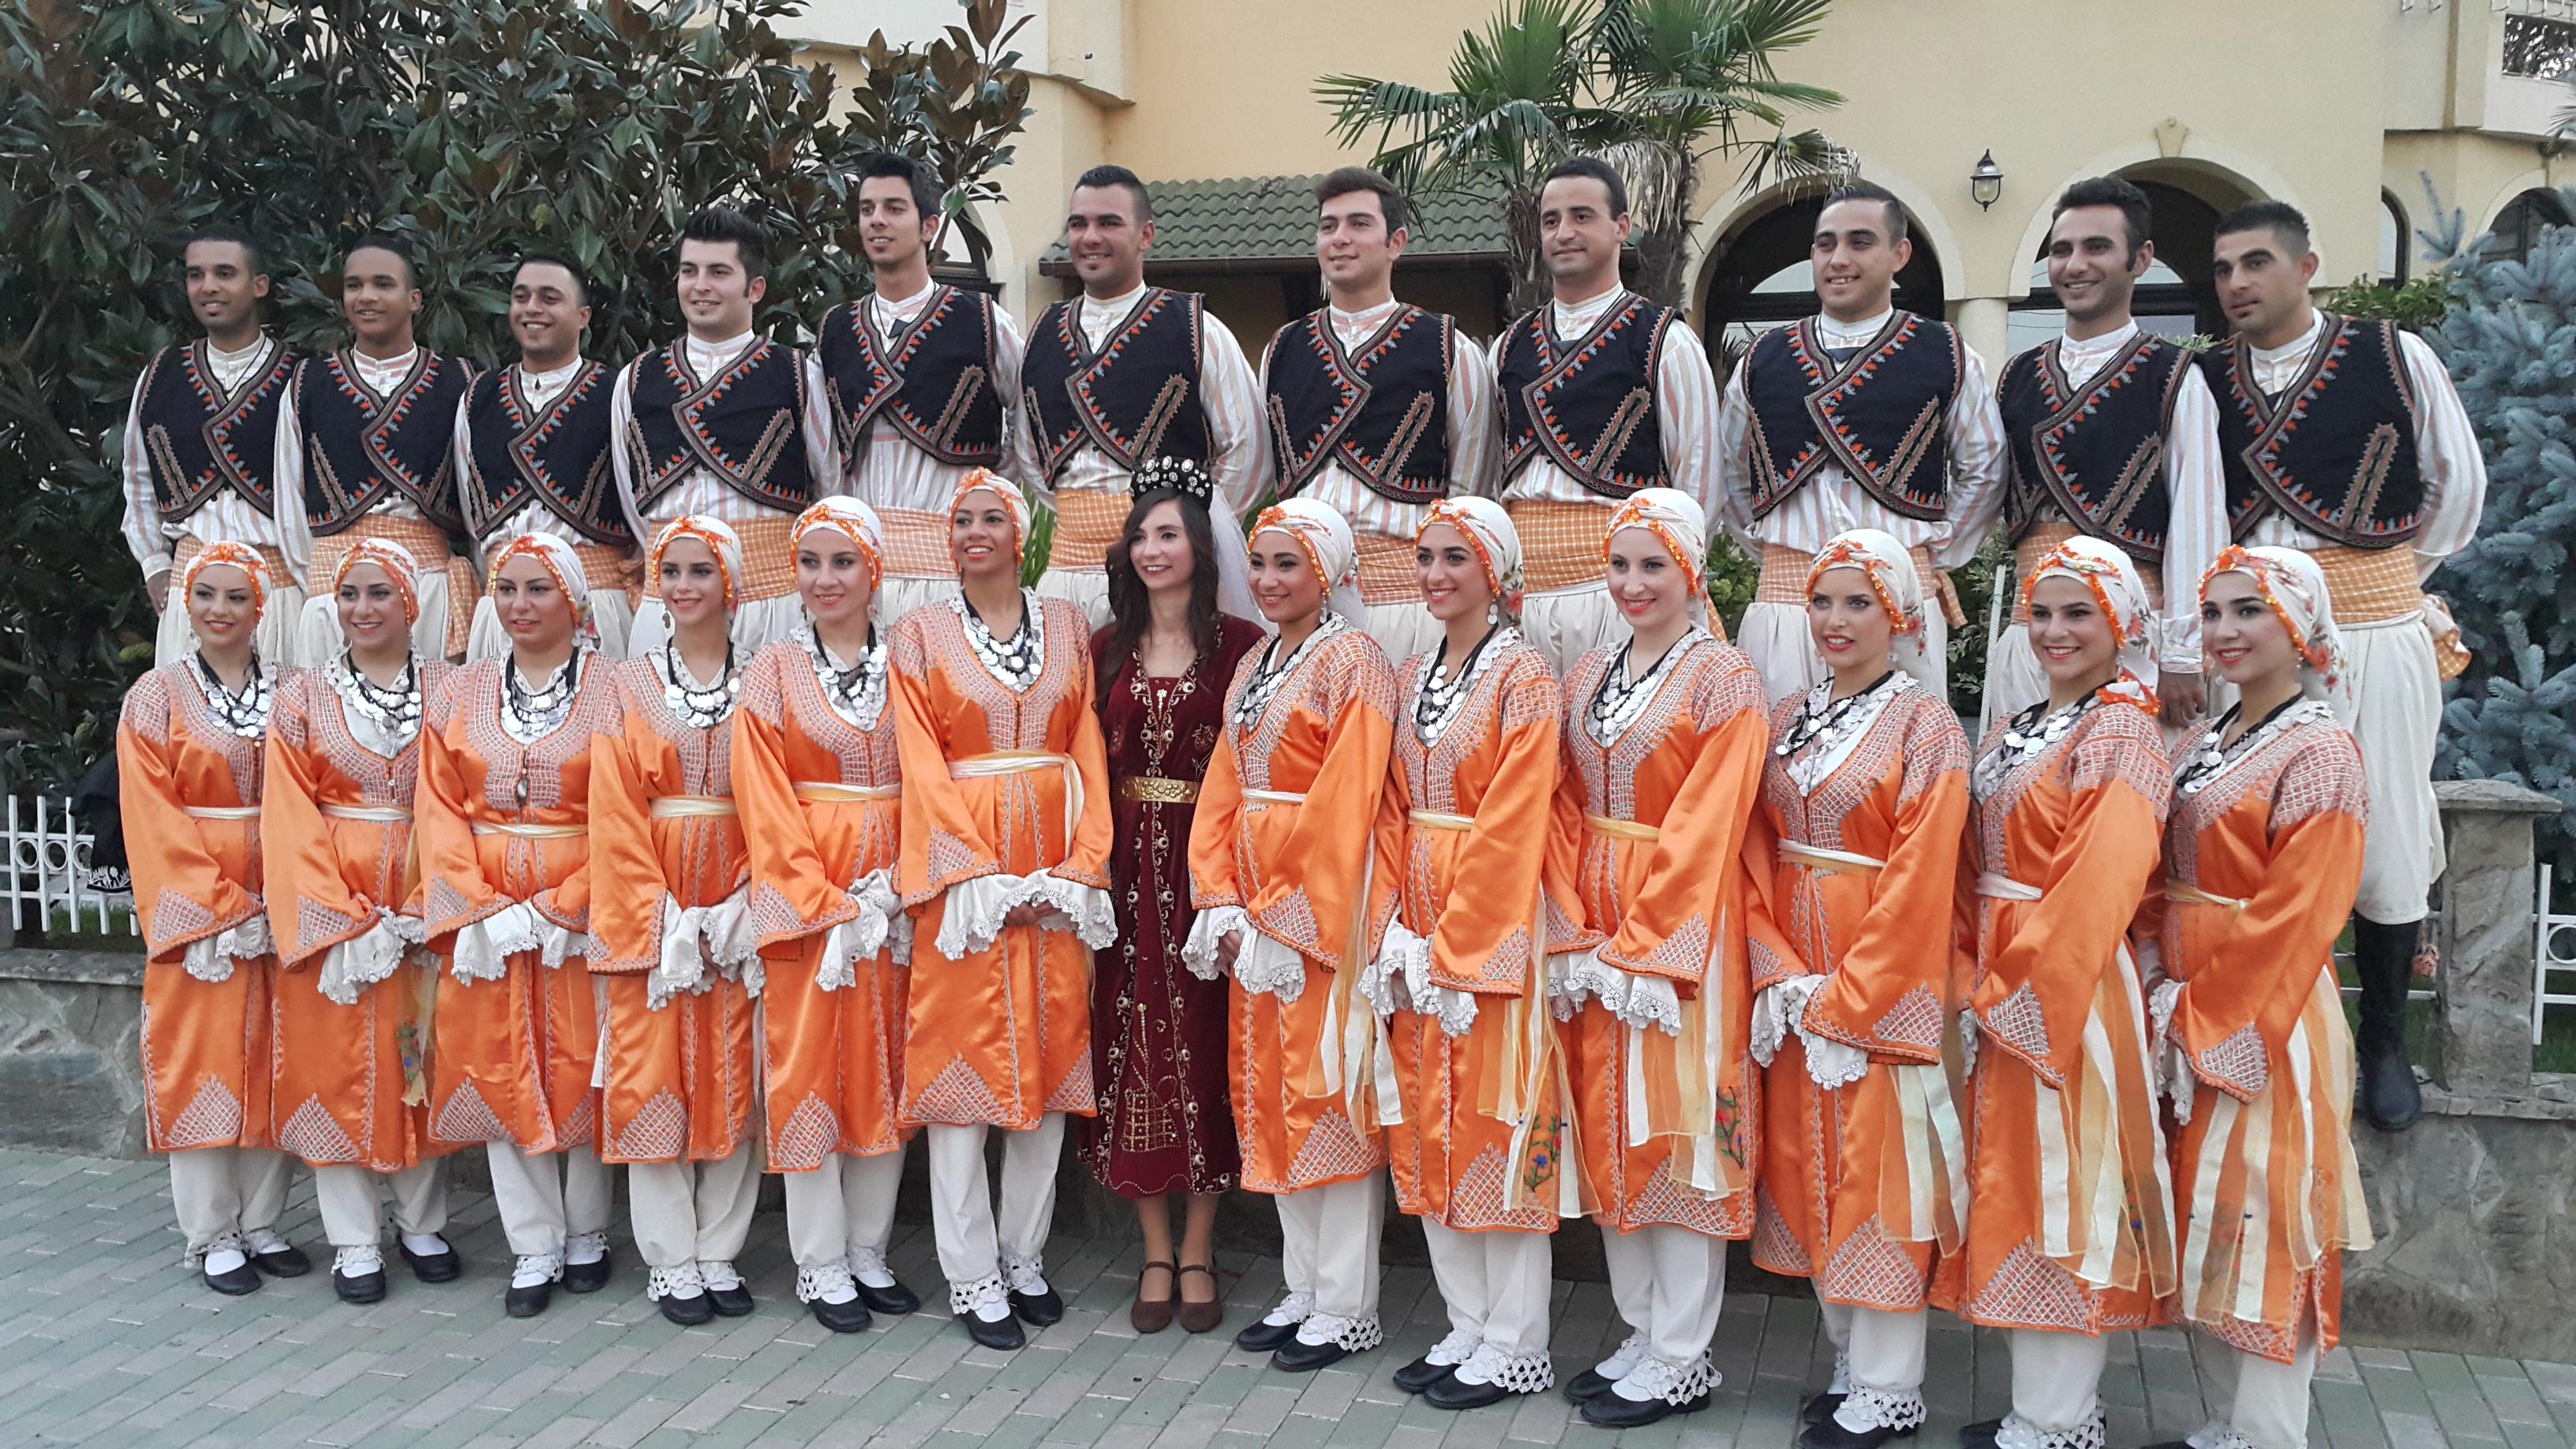 Cyprus - Iskele municipality folk dance group